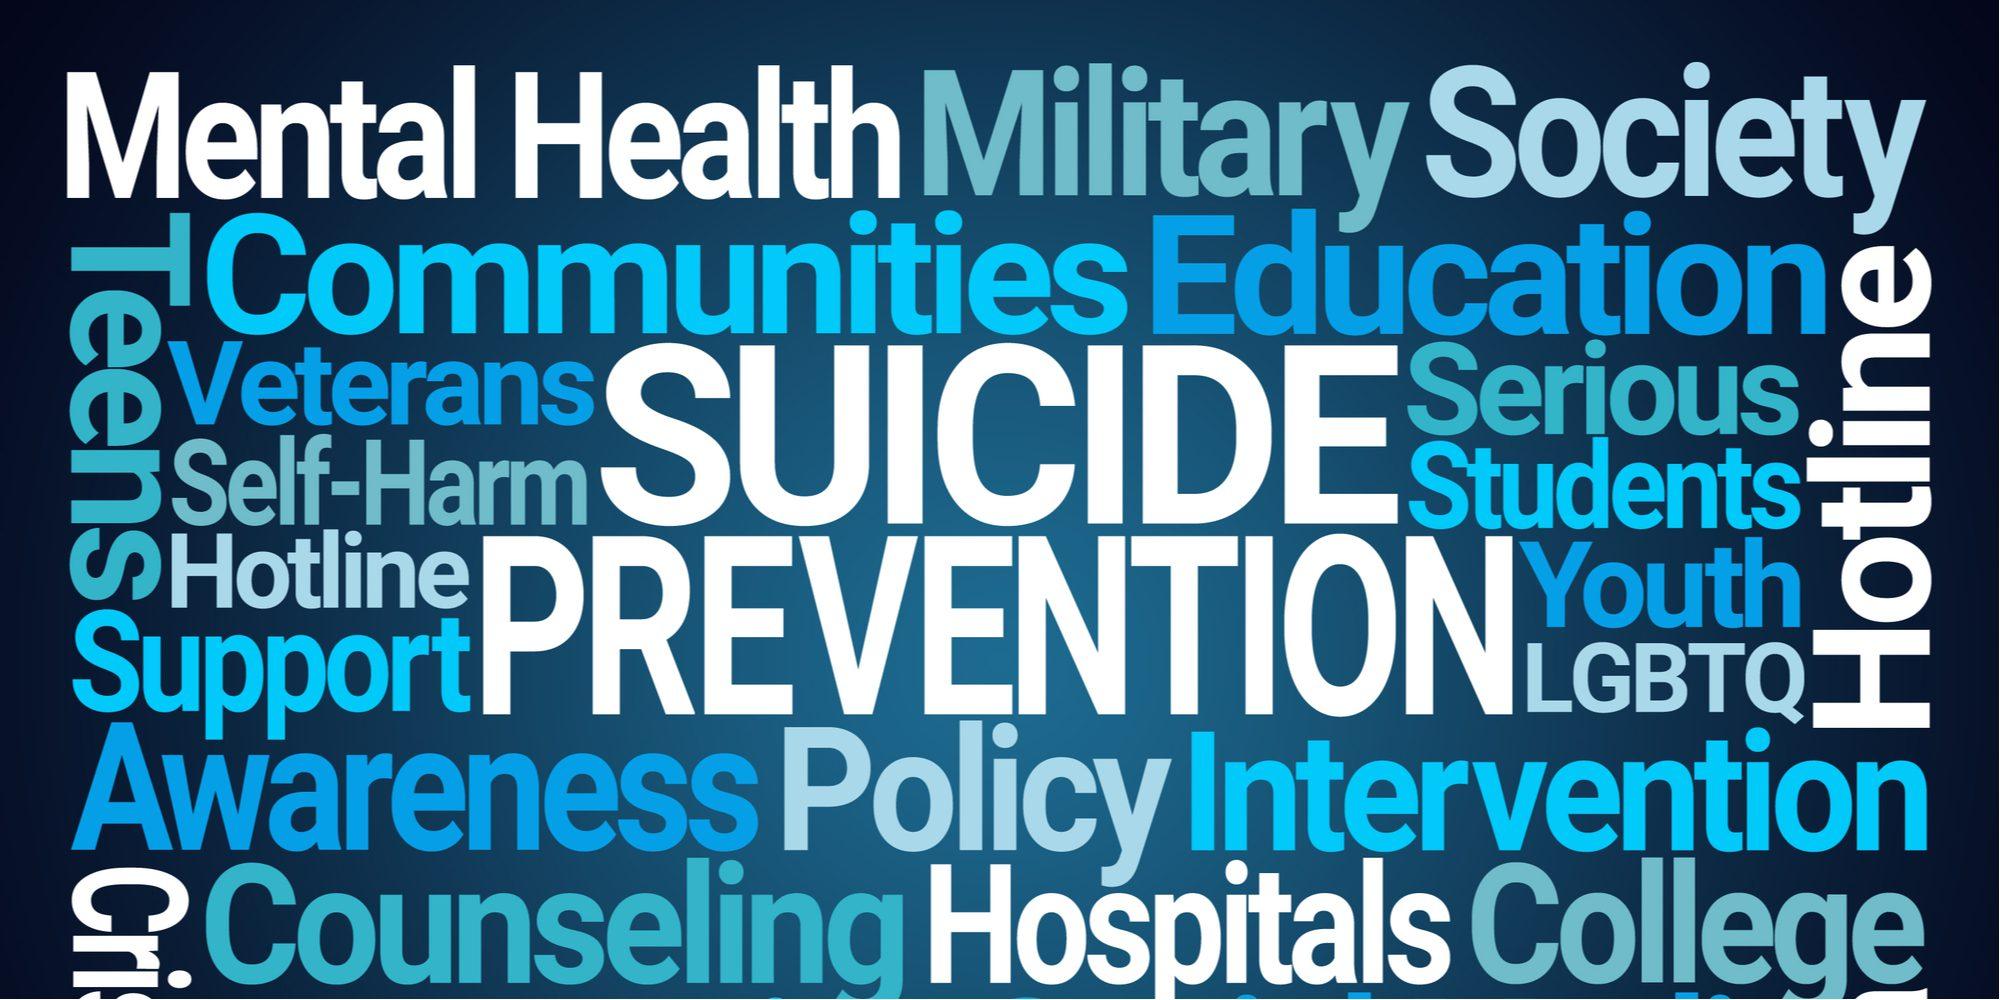 Ohio mental health